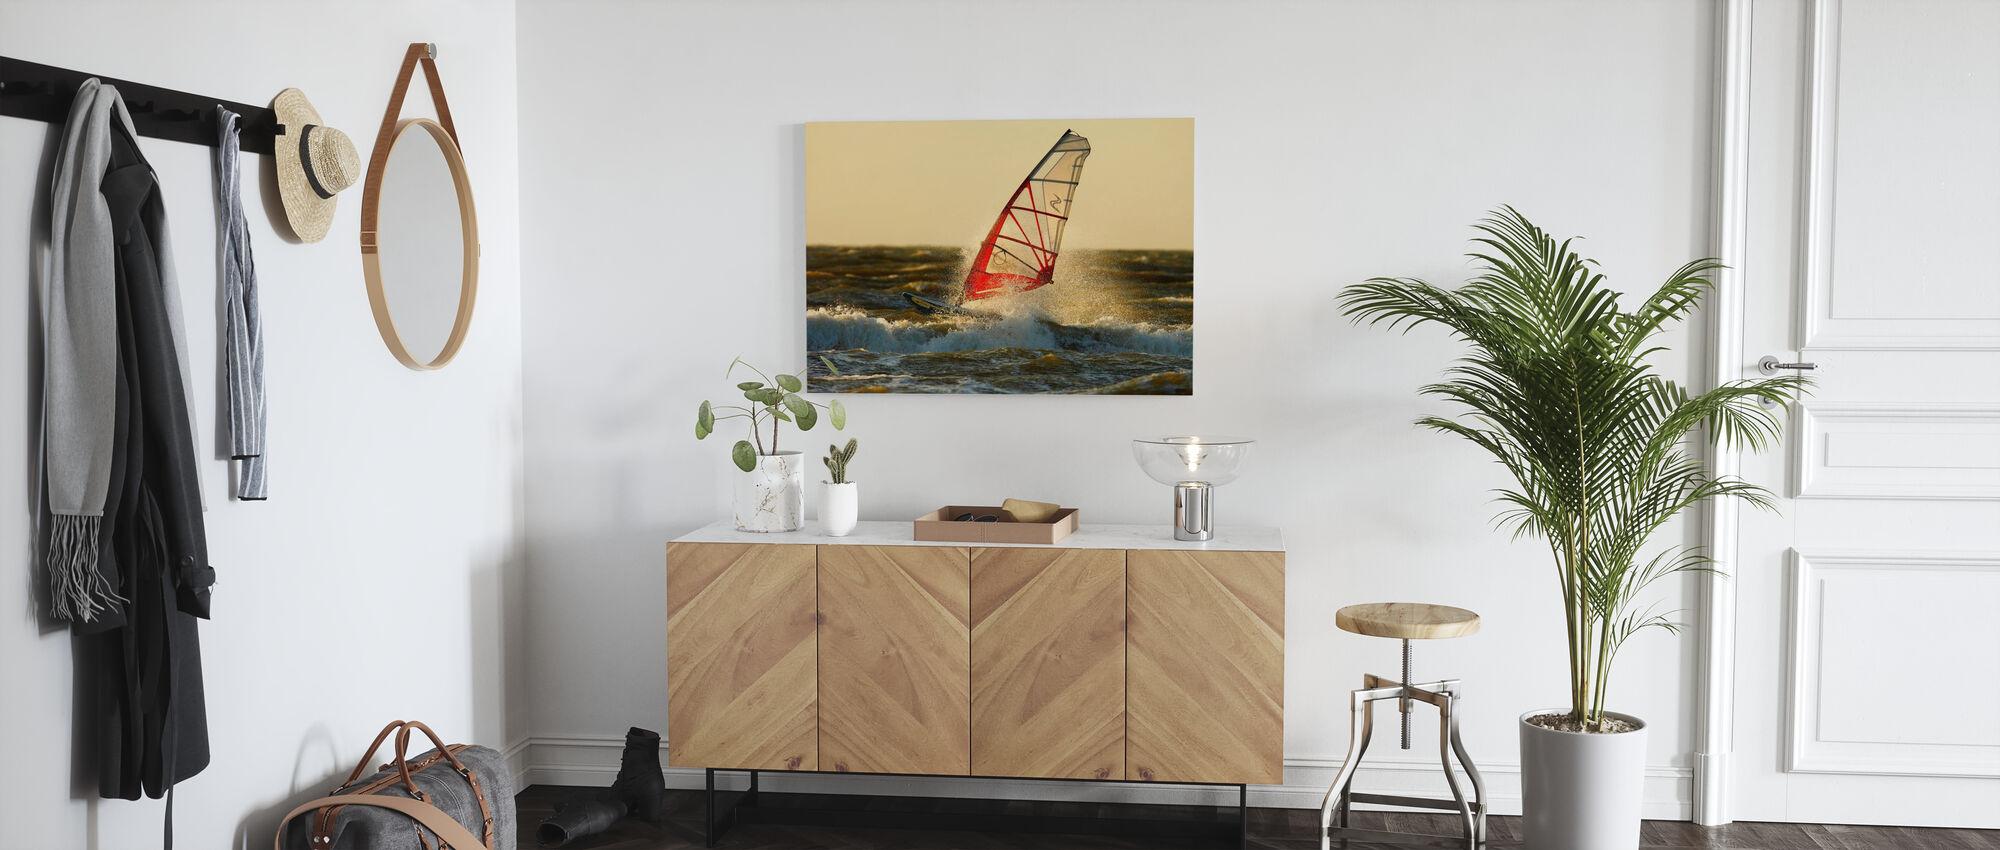 Surfen in Schweden, Europa - Leinwandbild - Flur